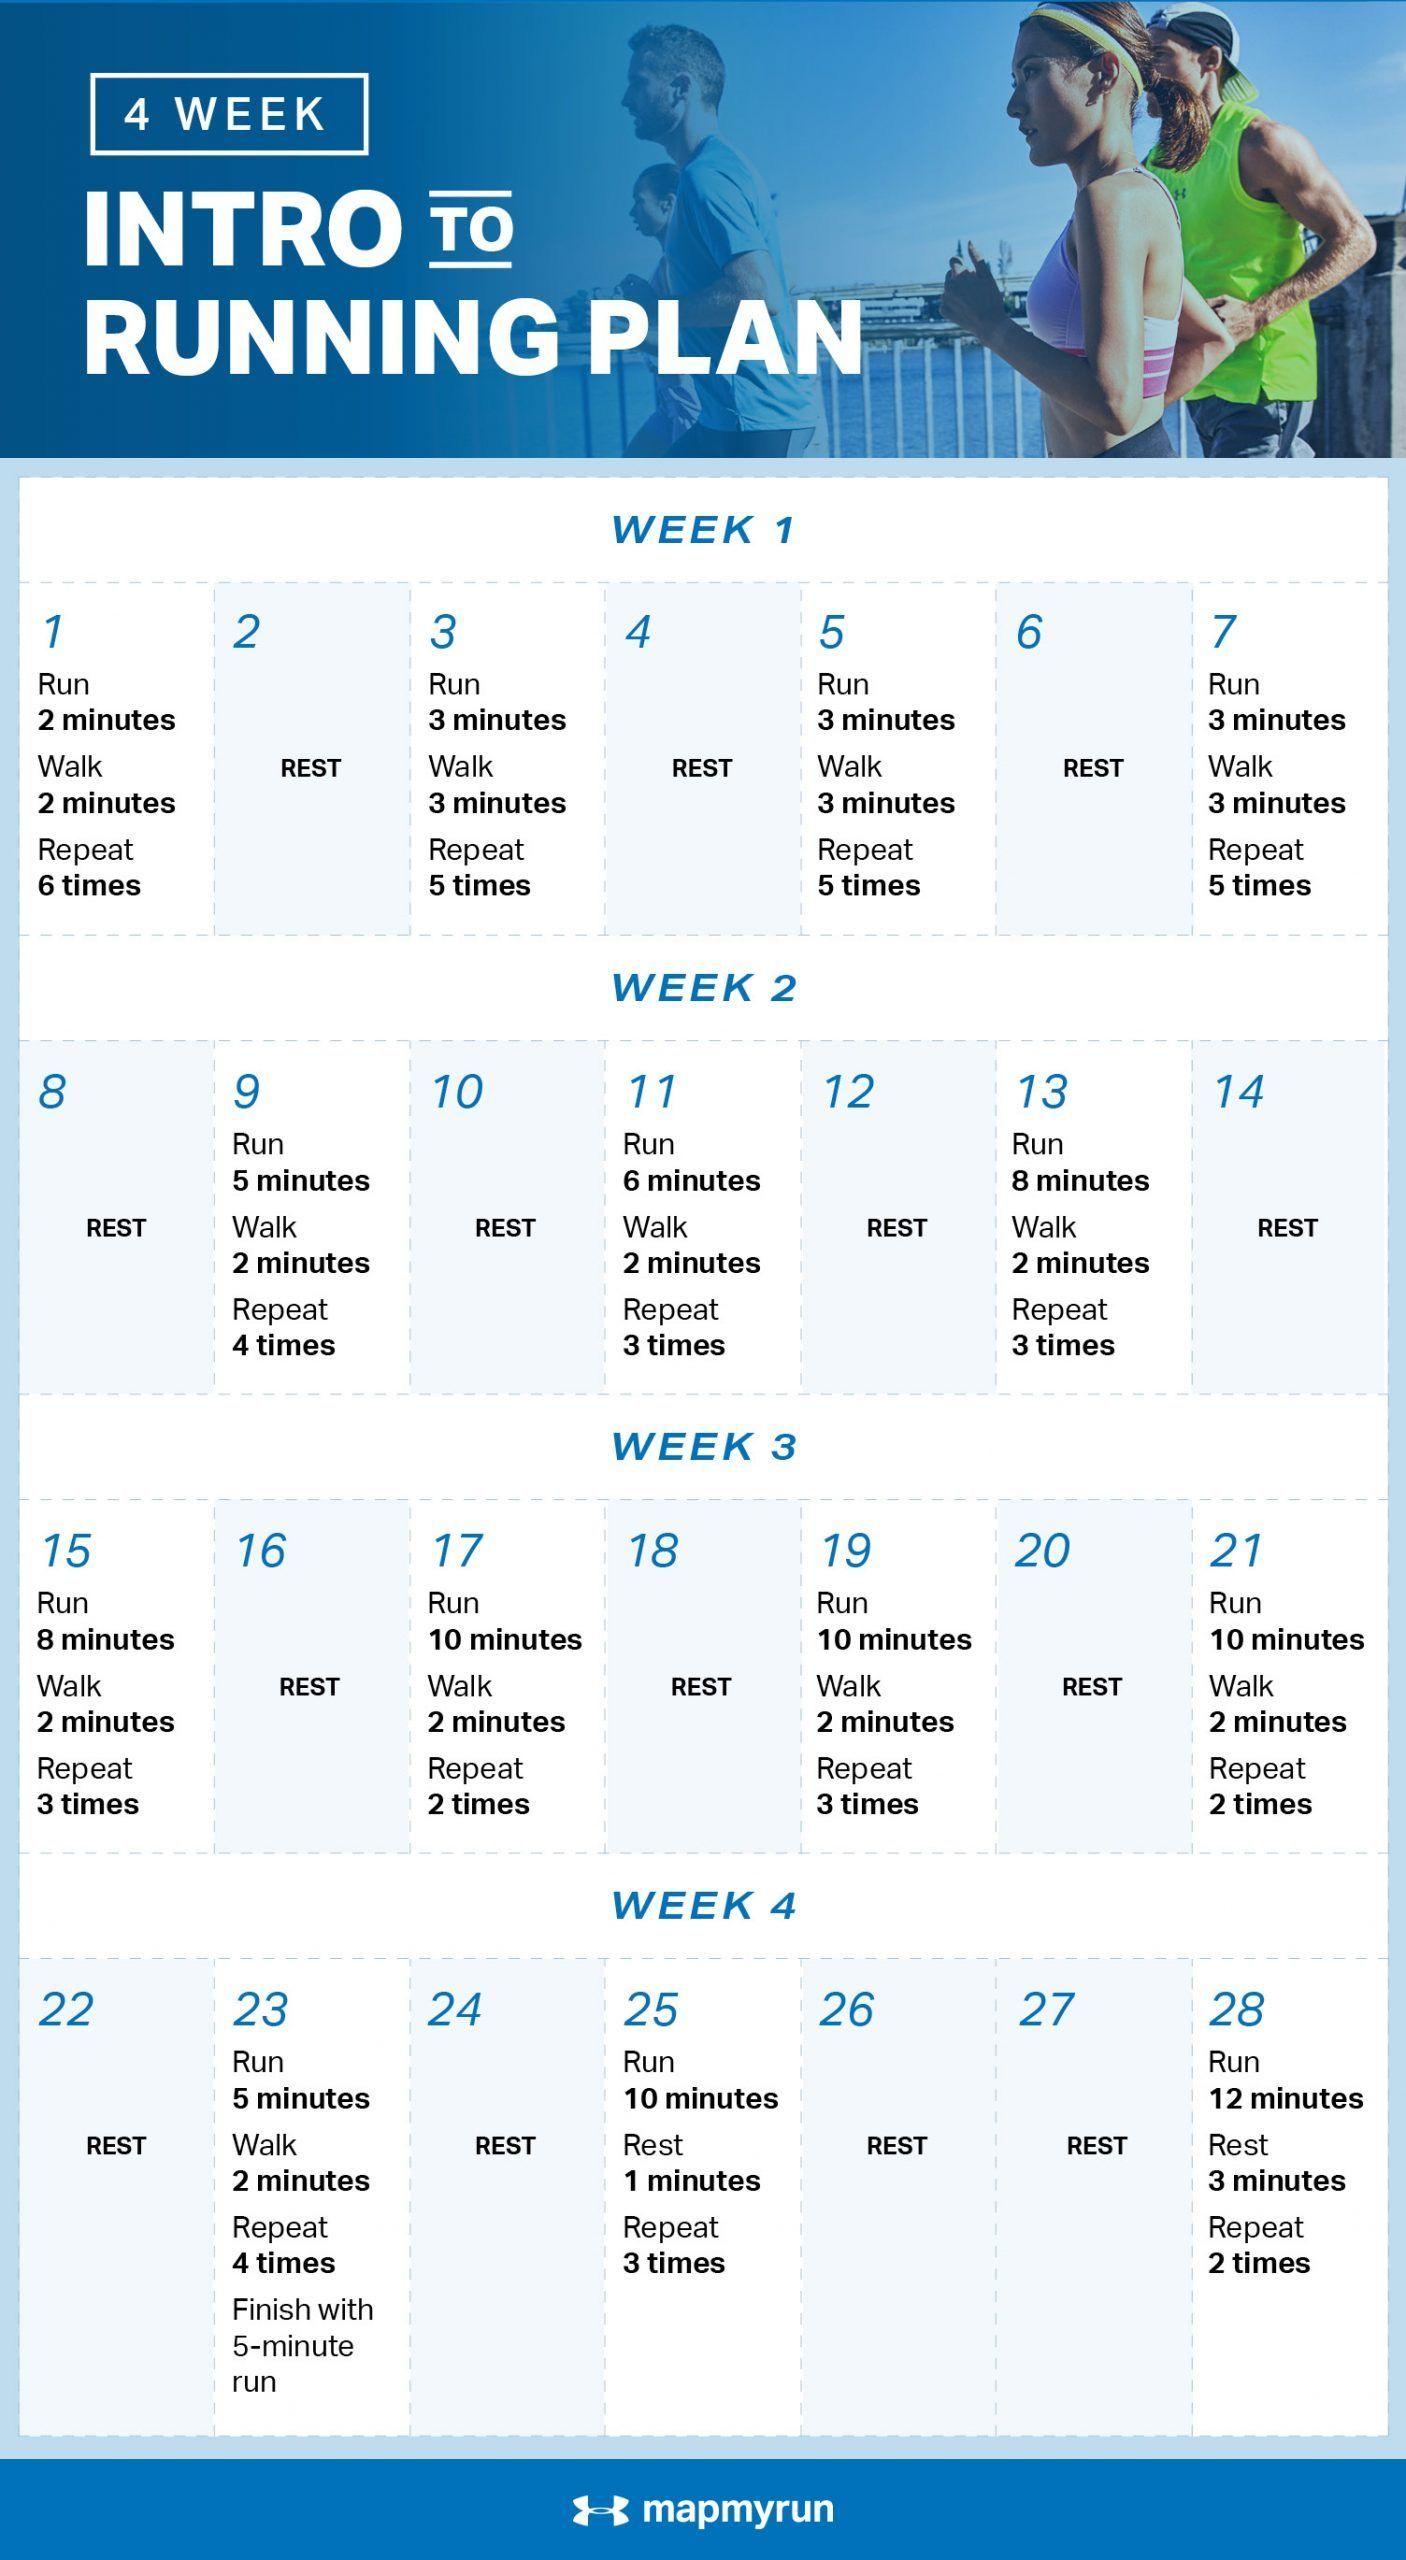 4-Week Intro to Running Plan | MapMyRun